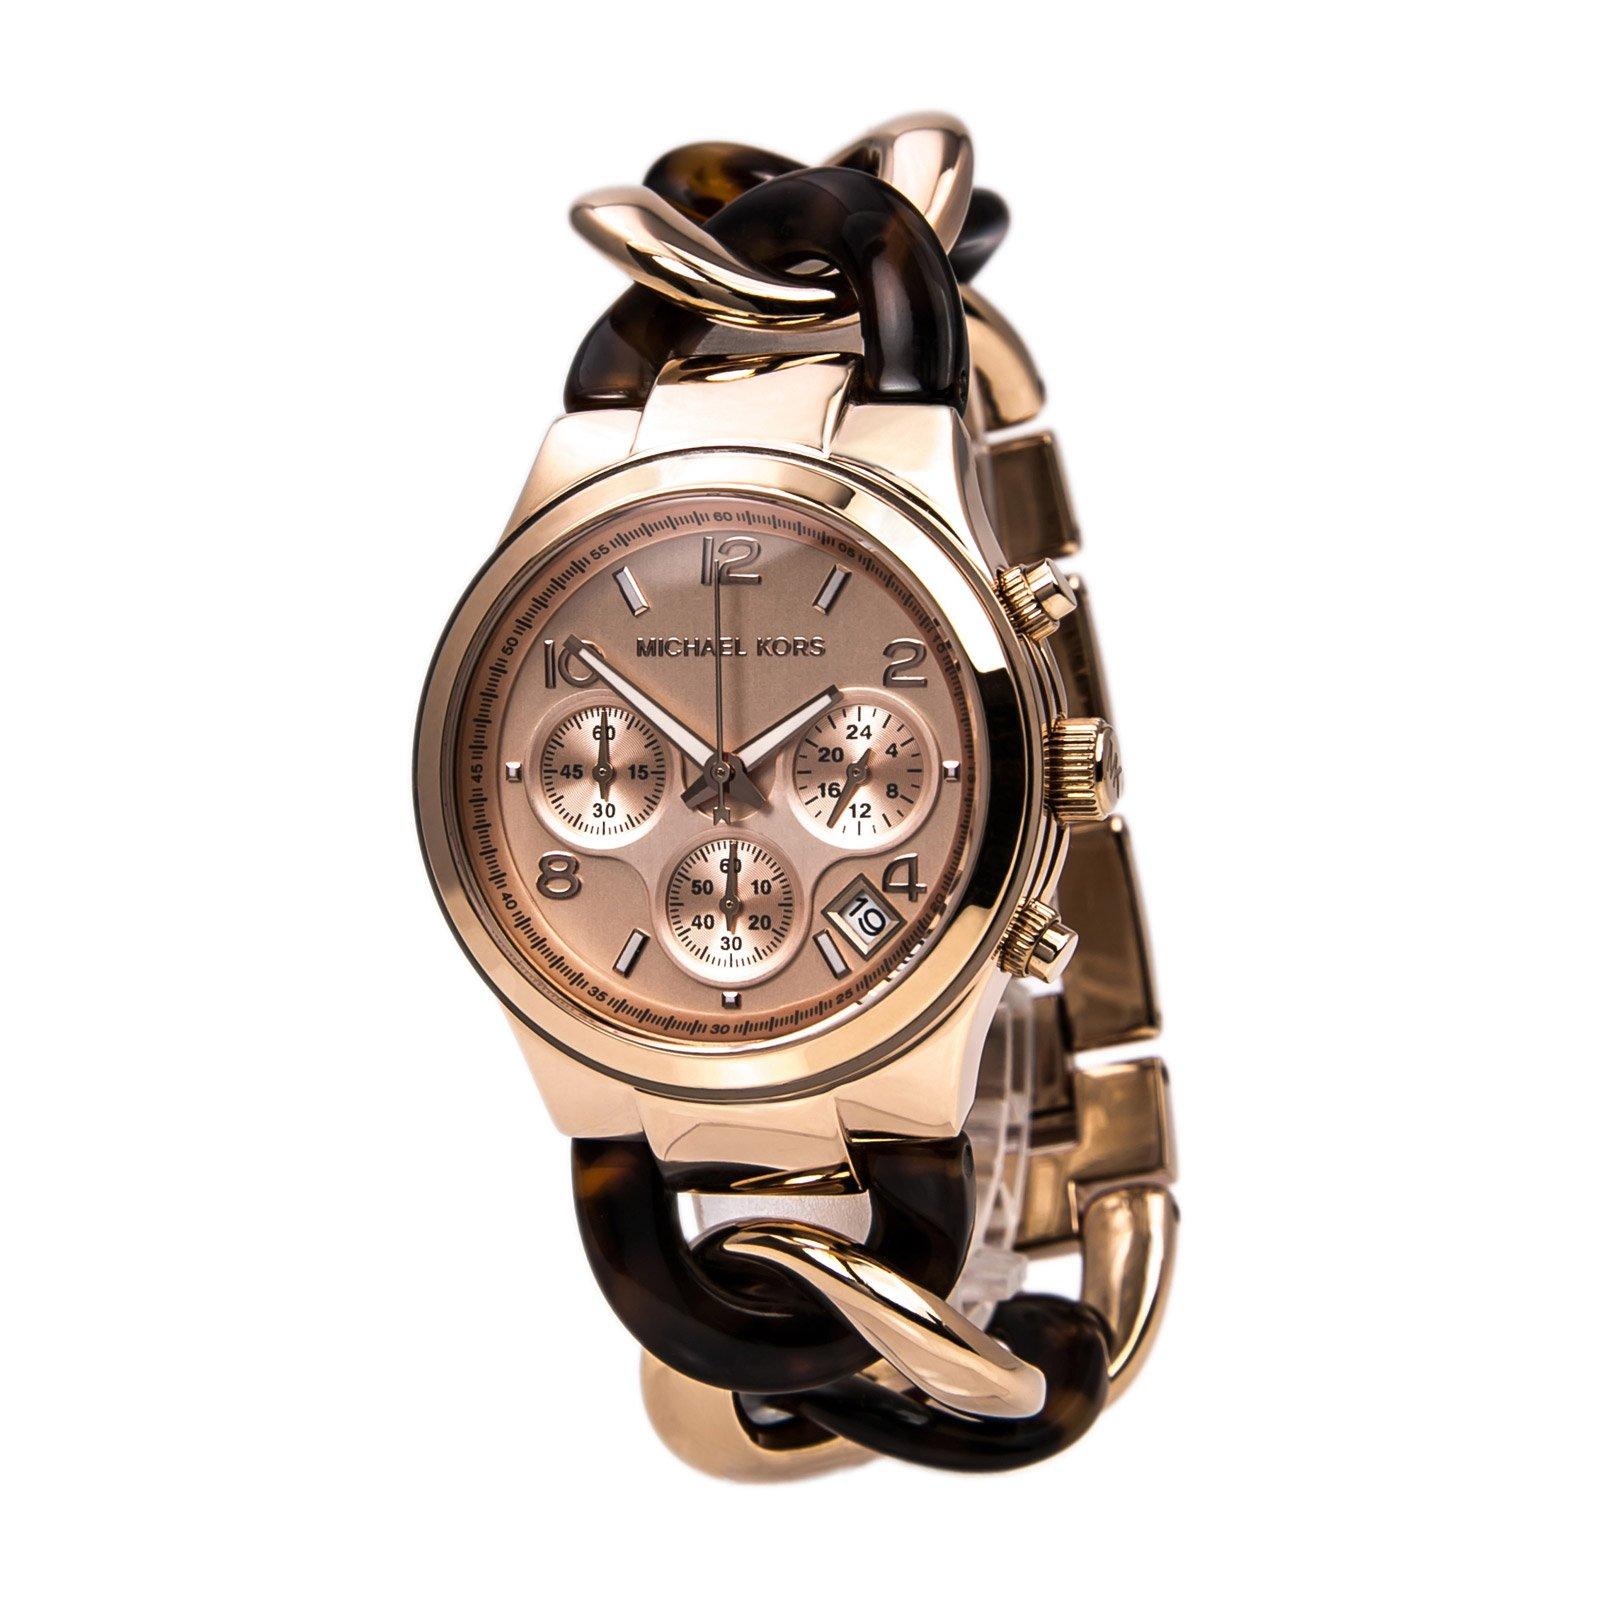 Michael Kors Women's 'Runway' Quartz Stainless Steel Watch, Color:Two Tone (Model: MK4269)